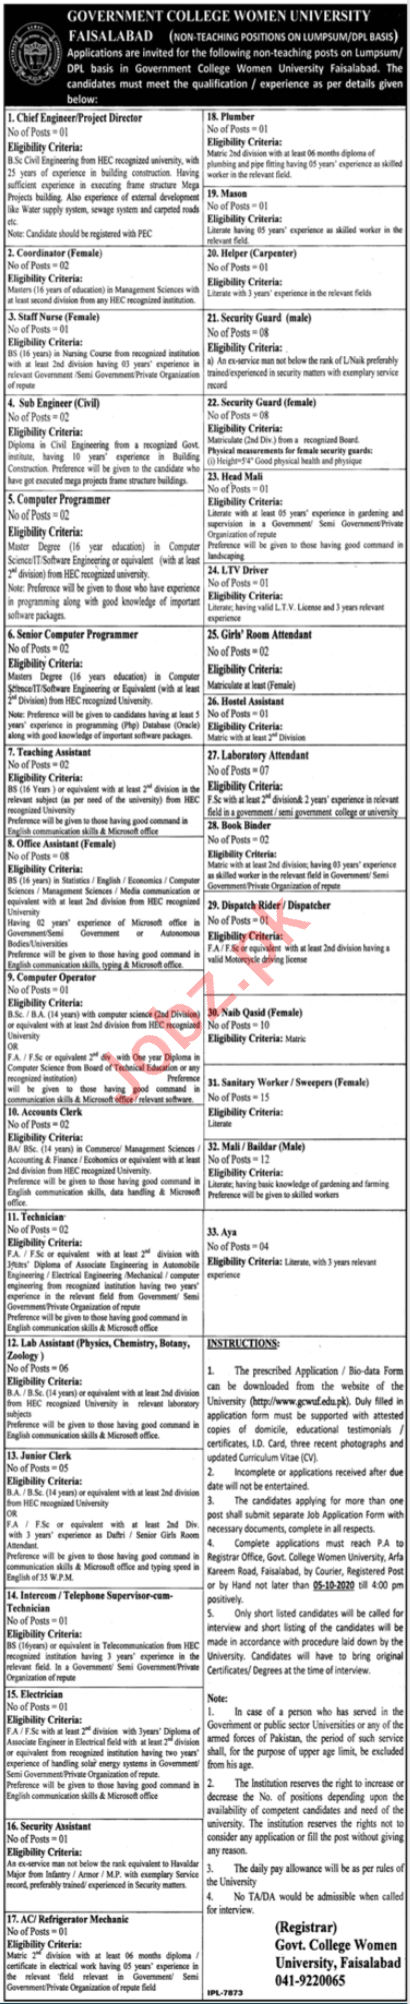 GCUF Government College University Faisalabad Jobs 2020